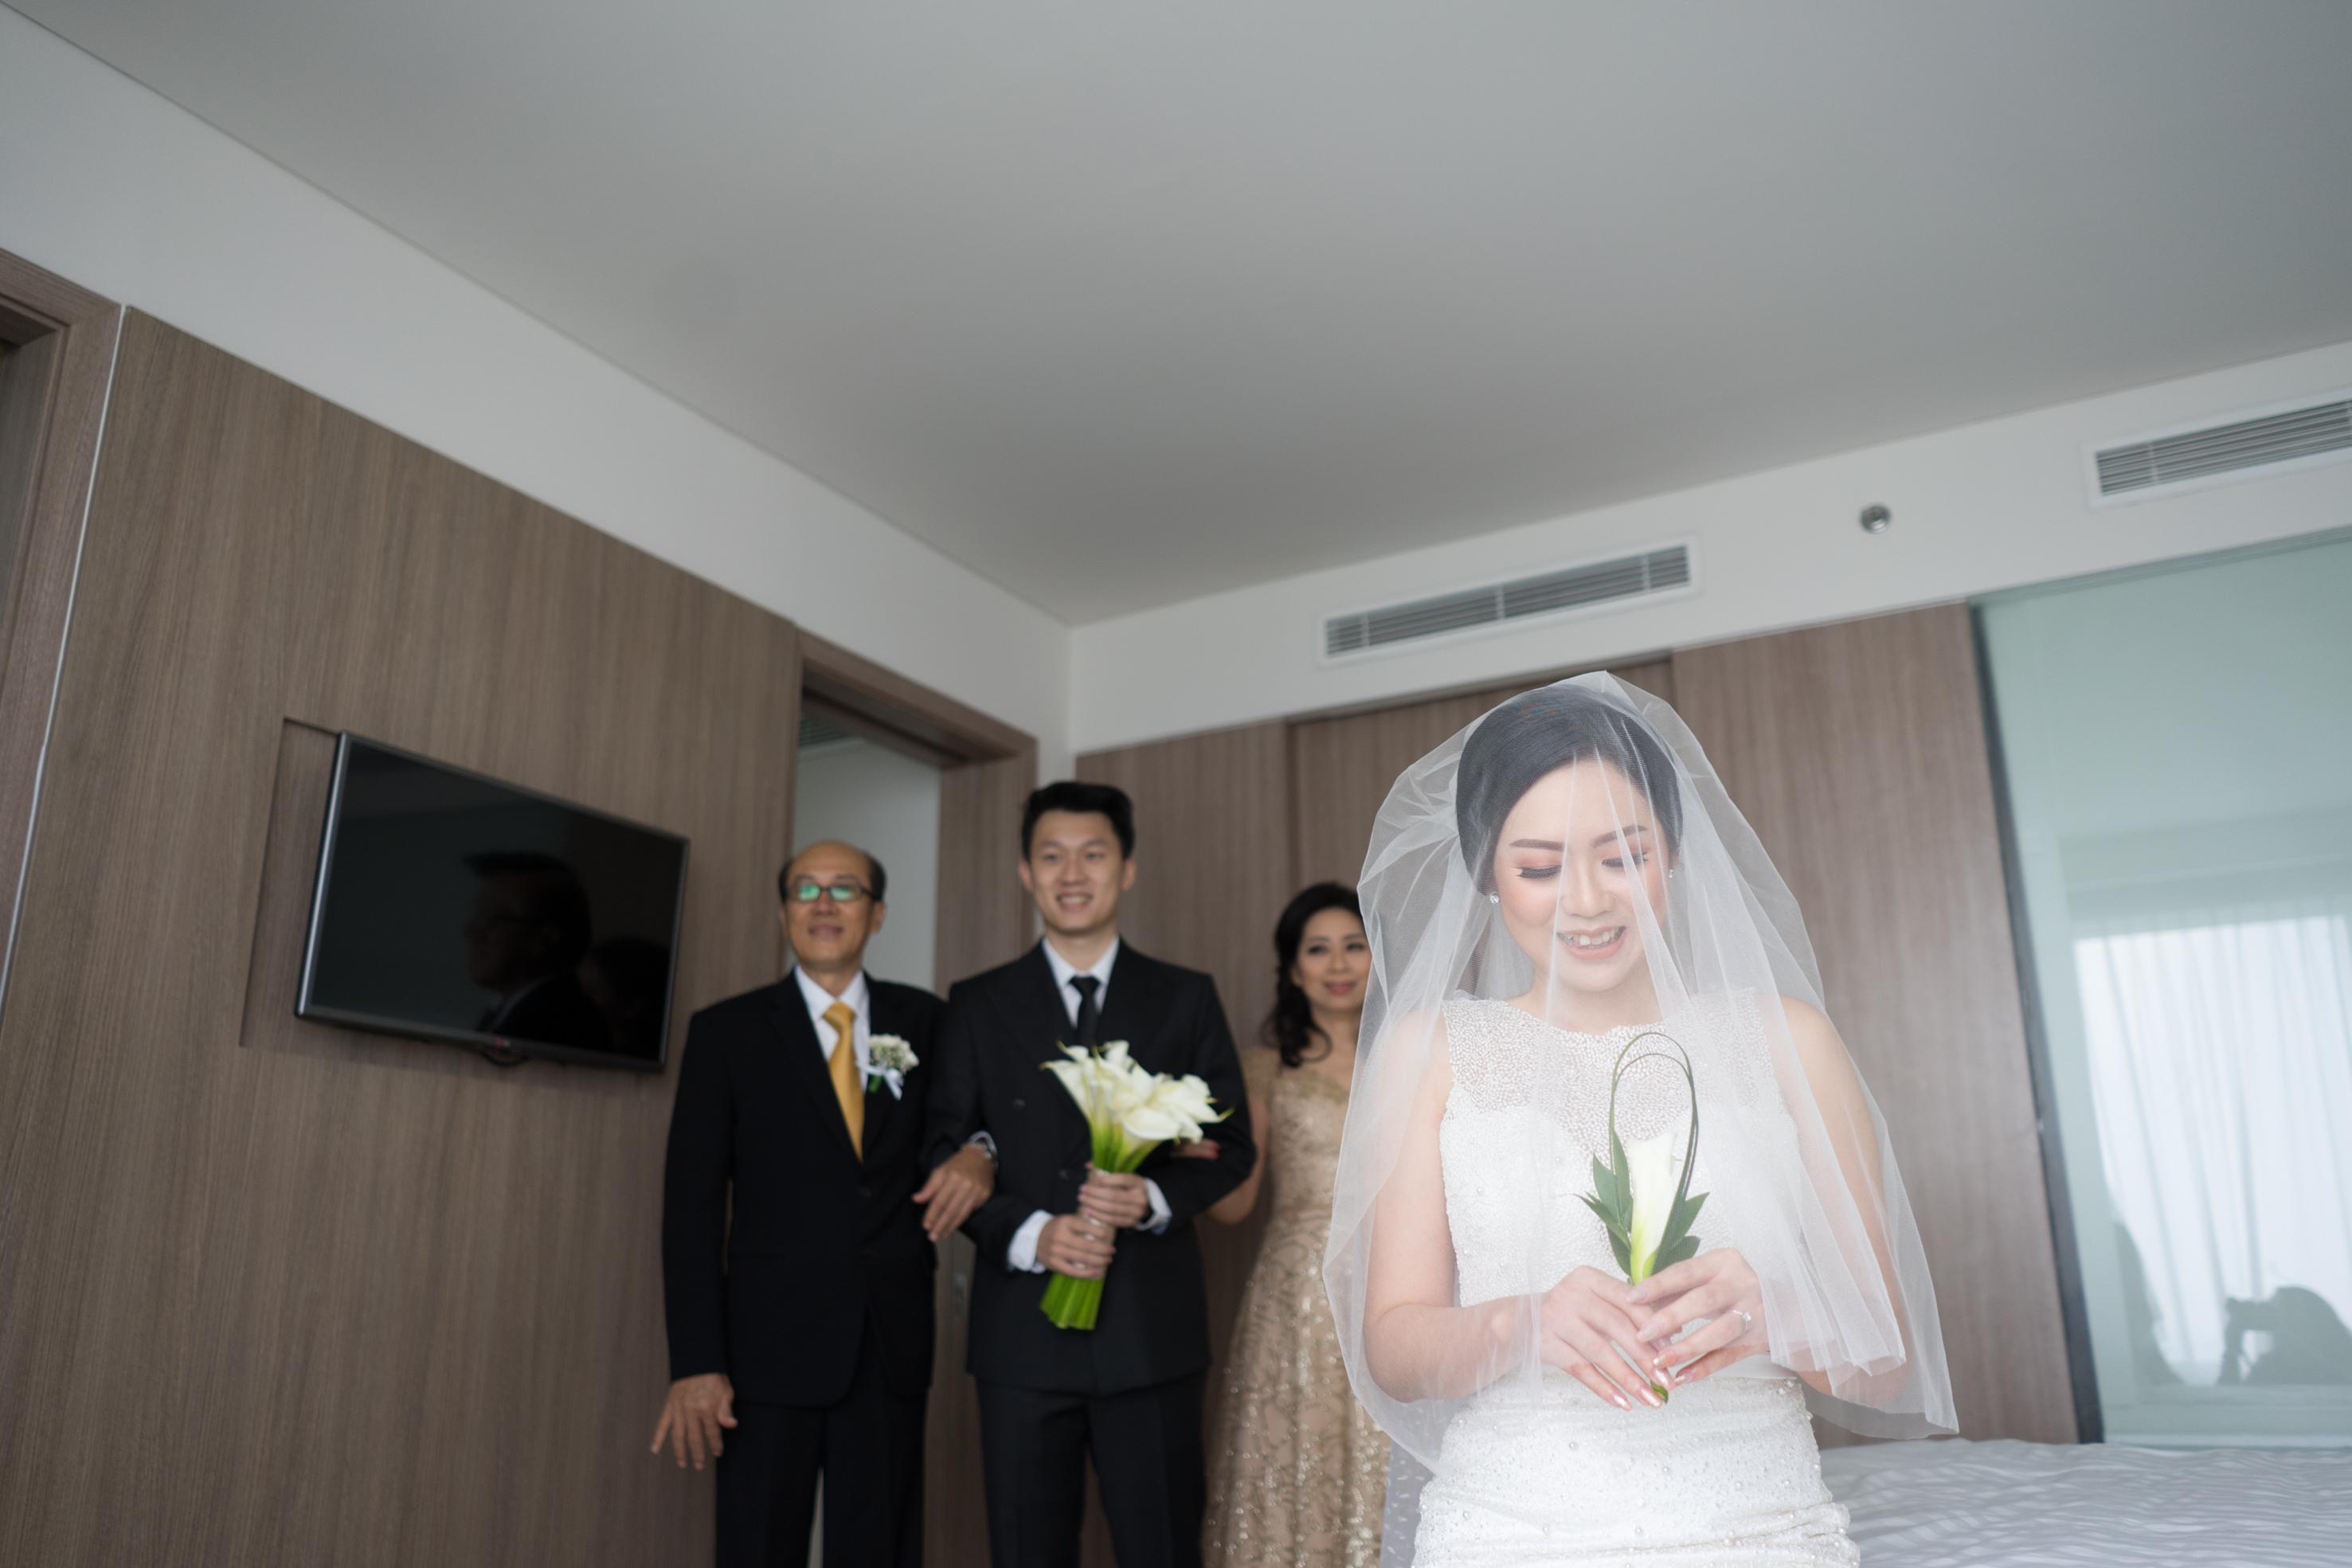 Raymond Leonie Wedding Day By Iris Photography Houseofcuff Collar Bar Lapel Pin Bros Jas Best Man Bow Tie Grey